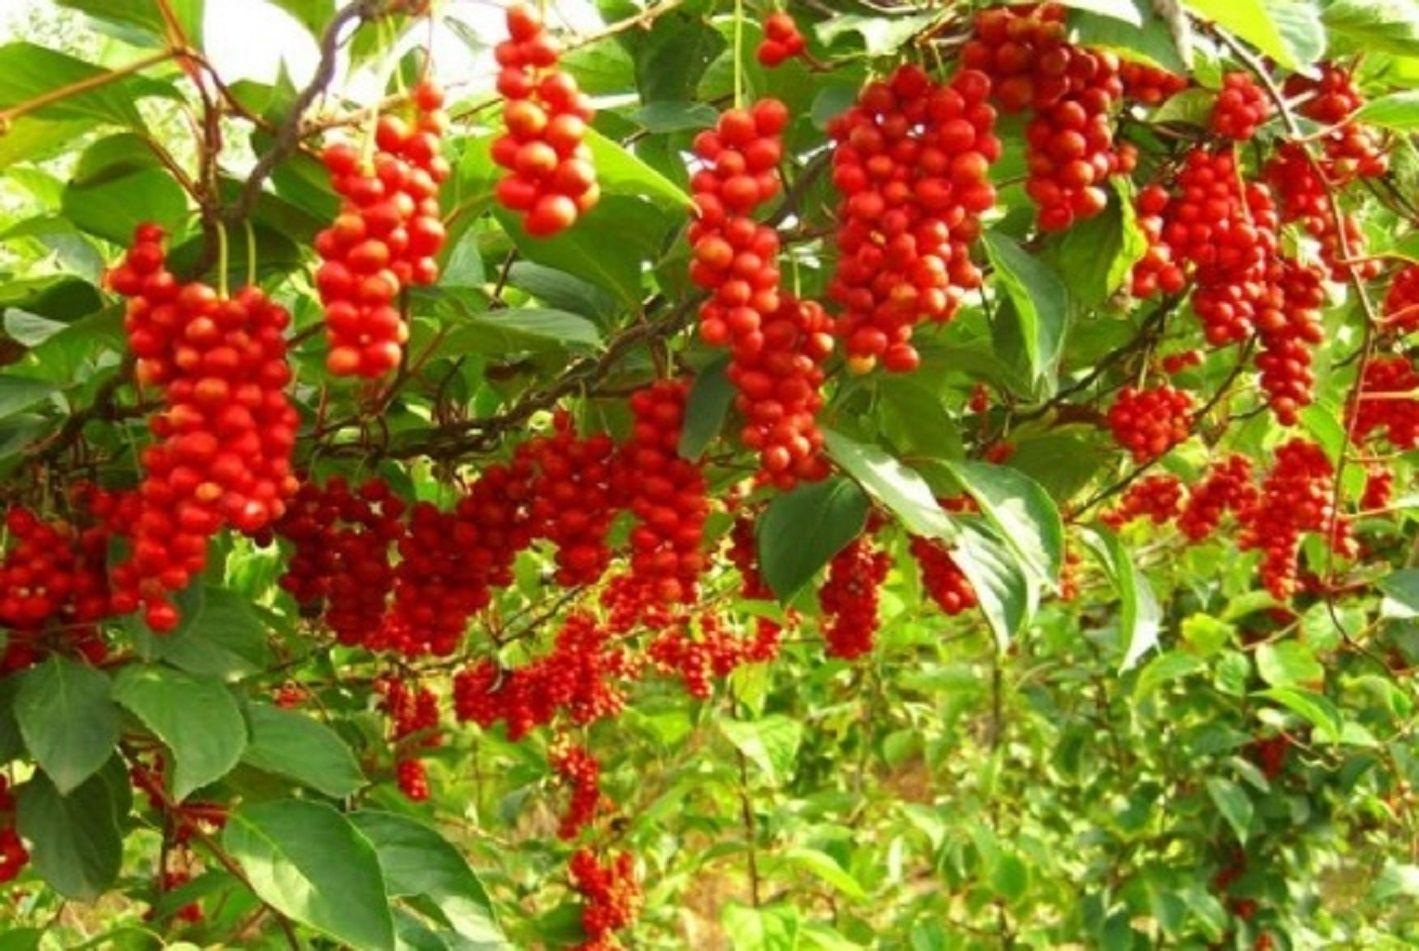 Jobelyn Natural Remedy For Cancer http://afritradomedic.blogspot.com/2016/07/jobelyn-natural-remedy-for-cancer.html